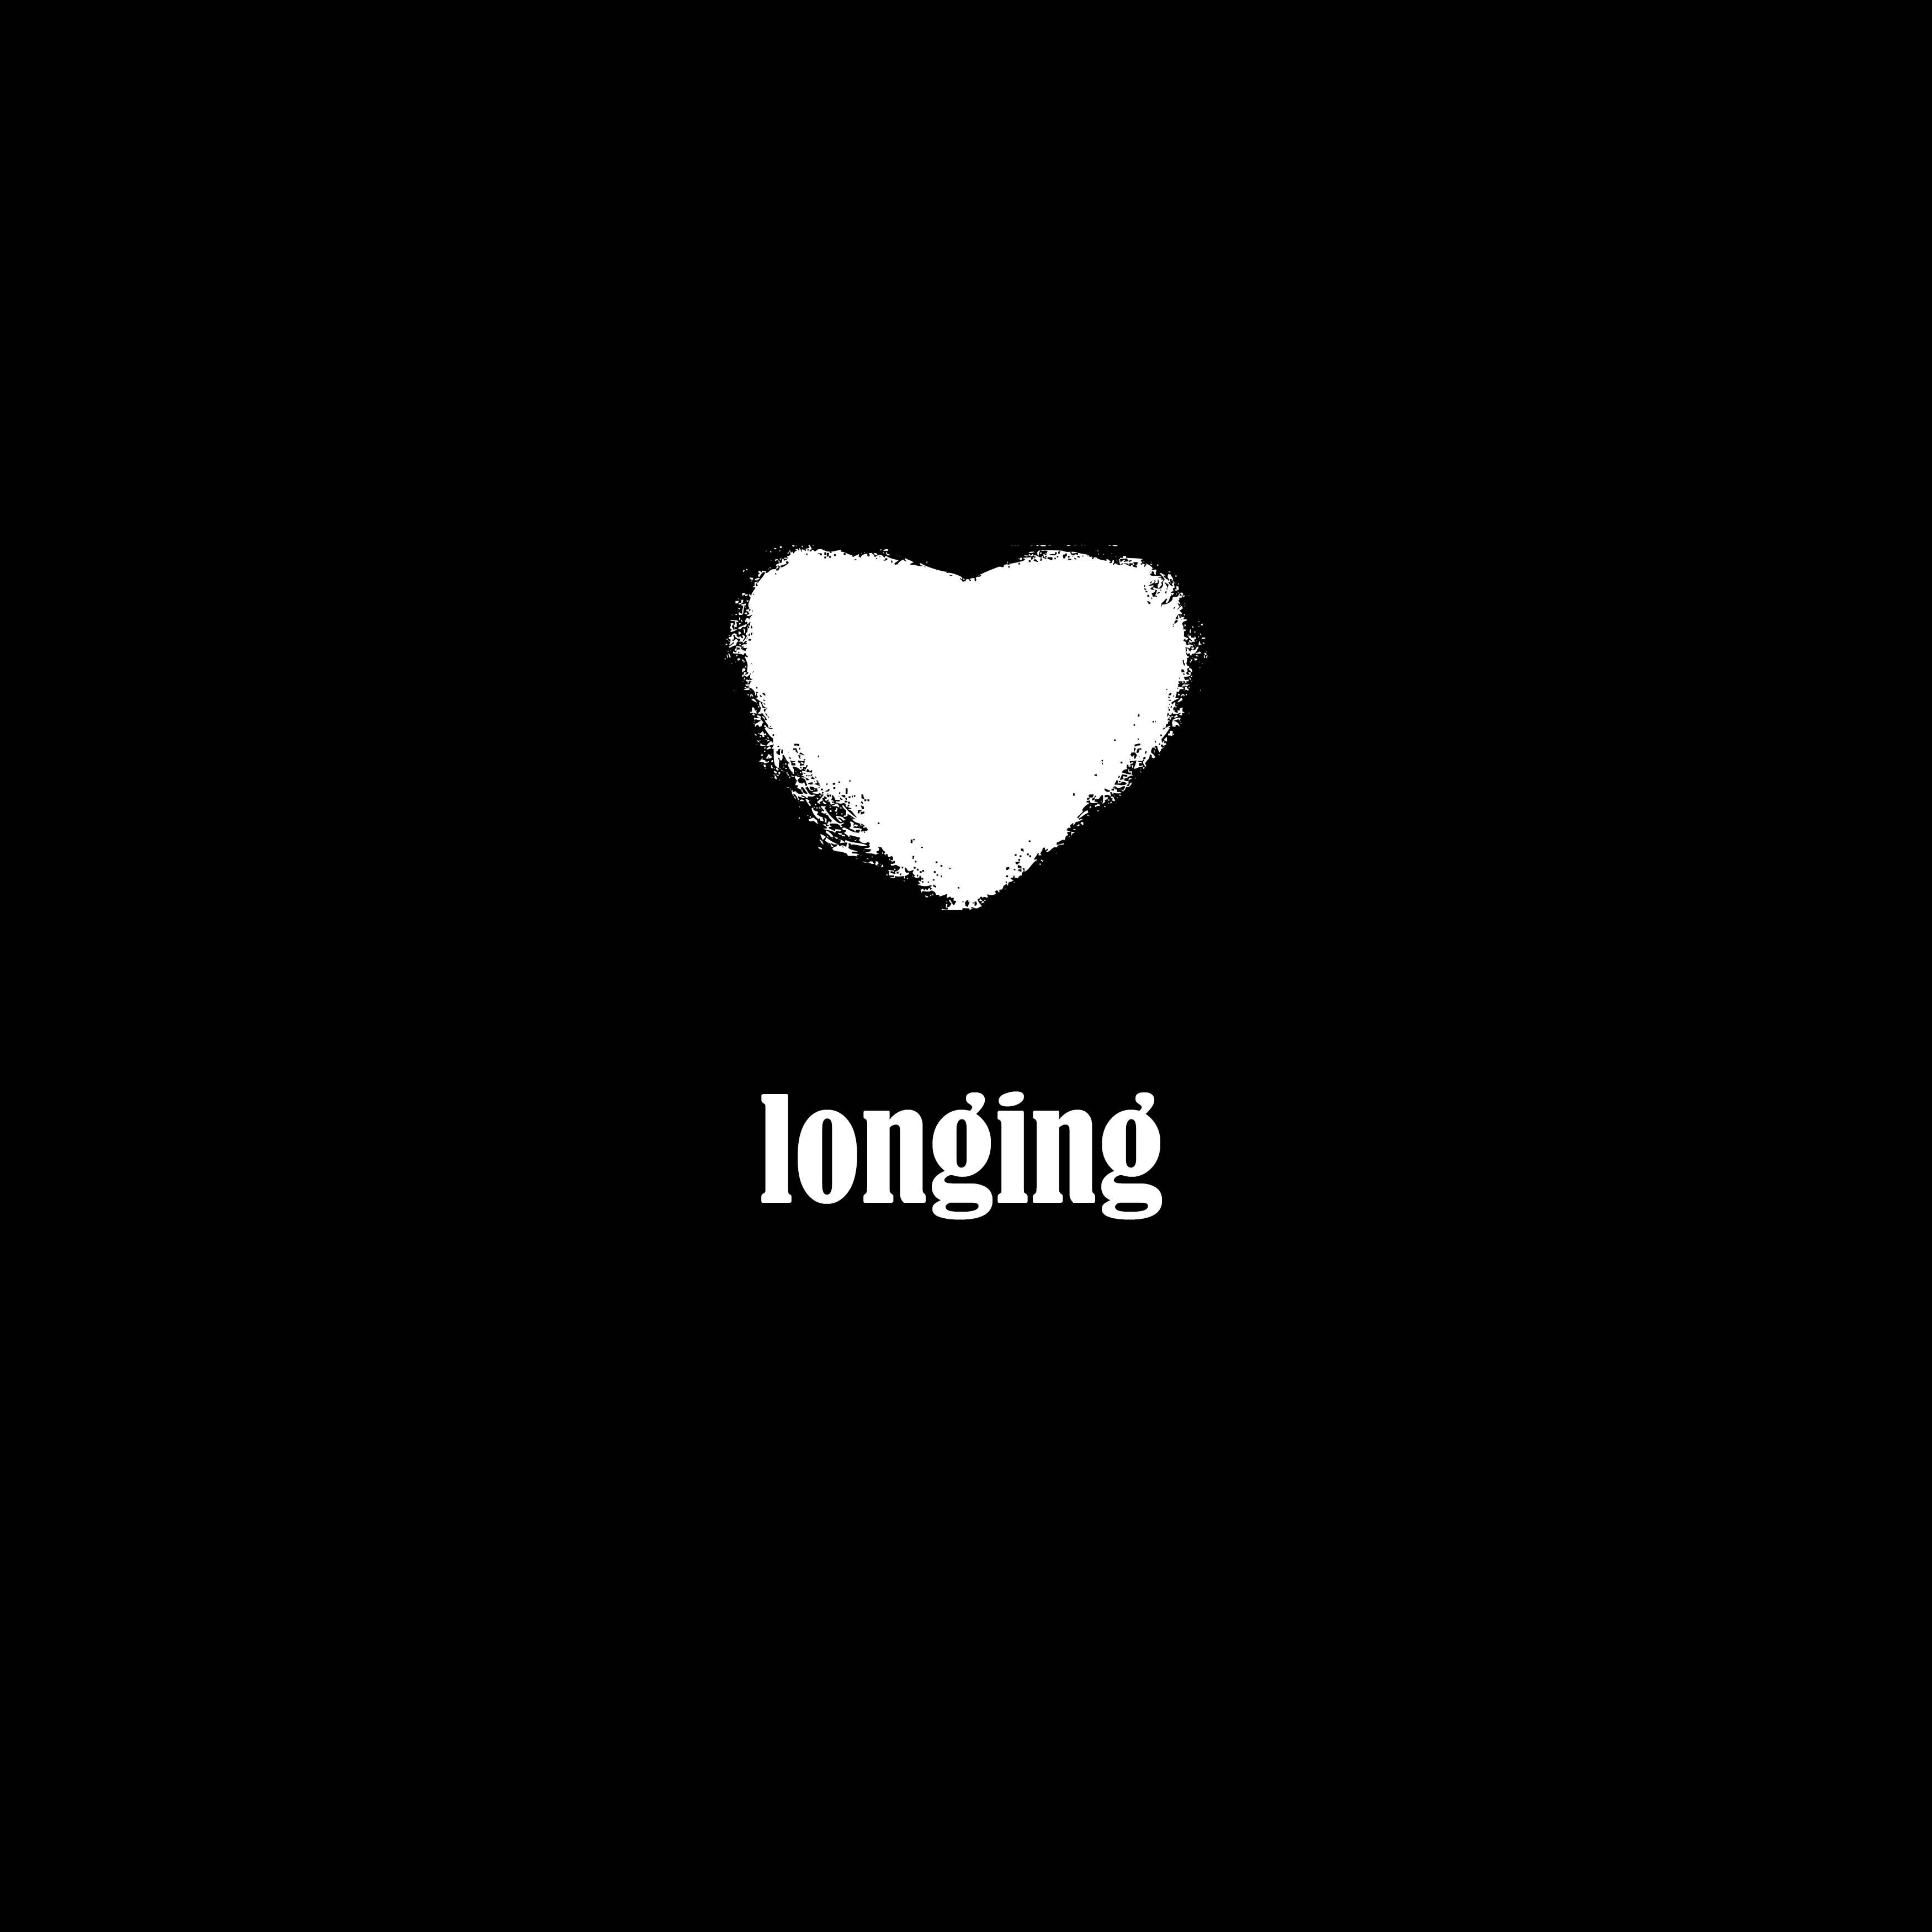 longing copy